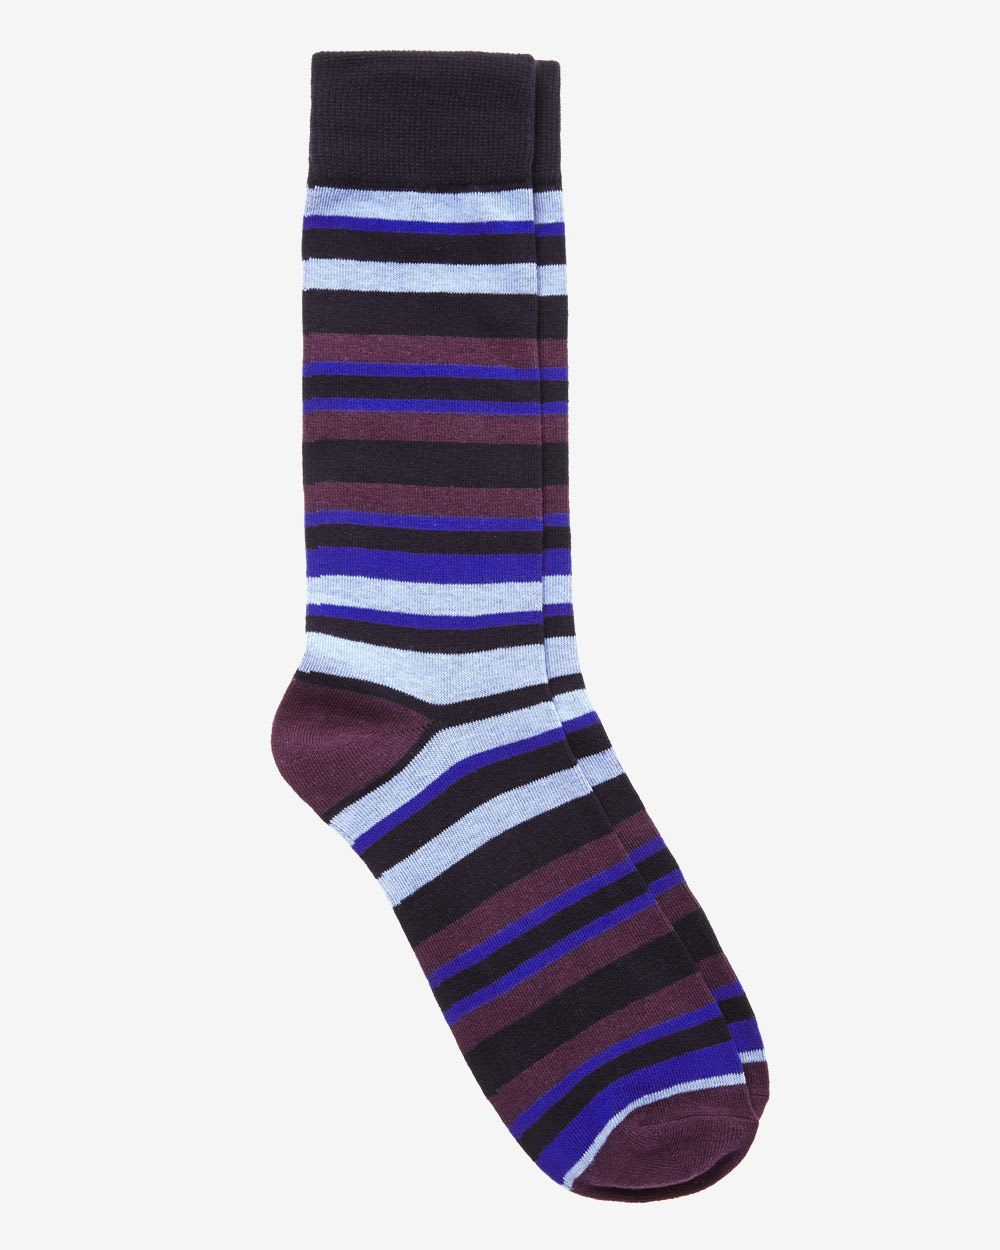 Cotton Marled Socks. BROOKS BROTHERS. 45% linen, 38% cotton, 17% nylon. Machine wash, no tumble dry, no iron. Shoe size 7 1/2 -